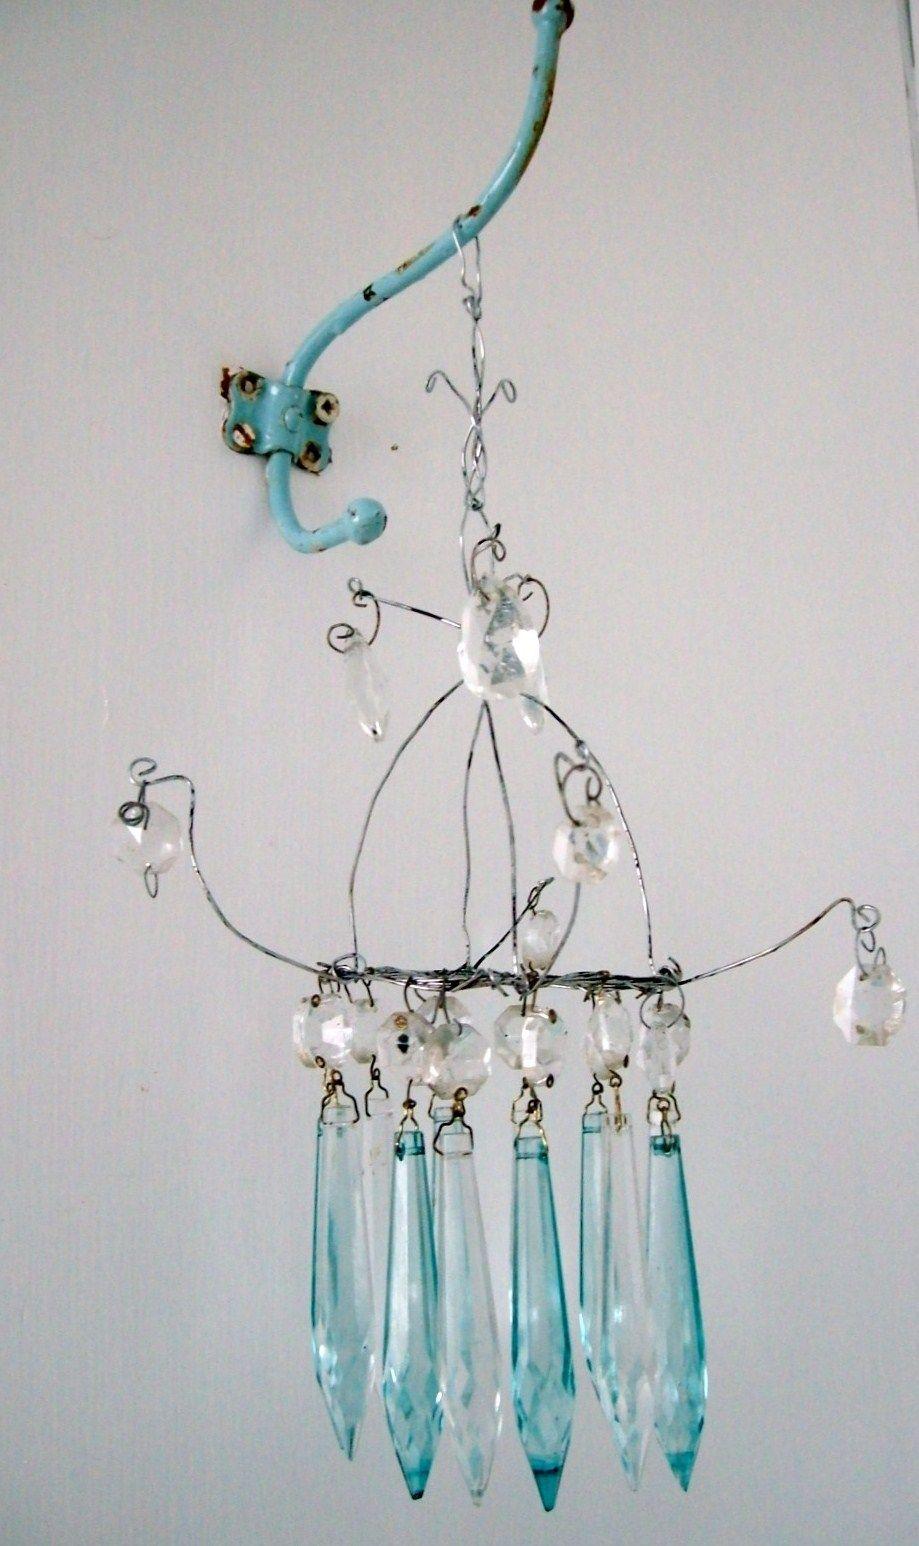 Diy mini chandelier repurposed pinterest mini chandelier diy mini chandelier arubaitofo Images